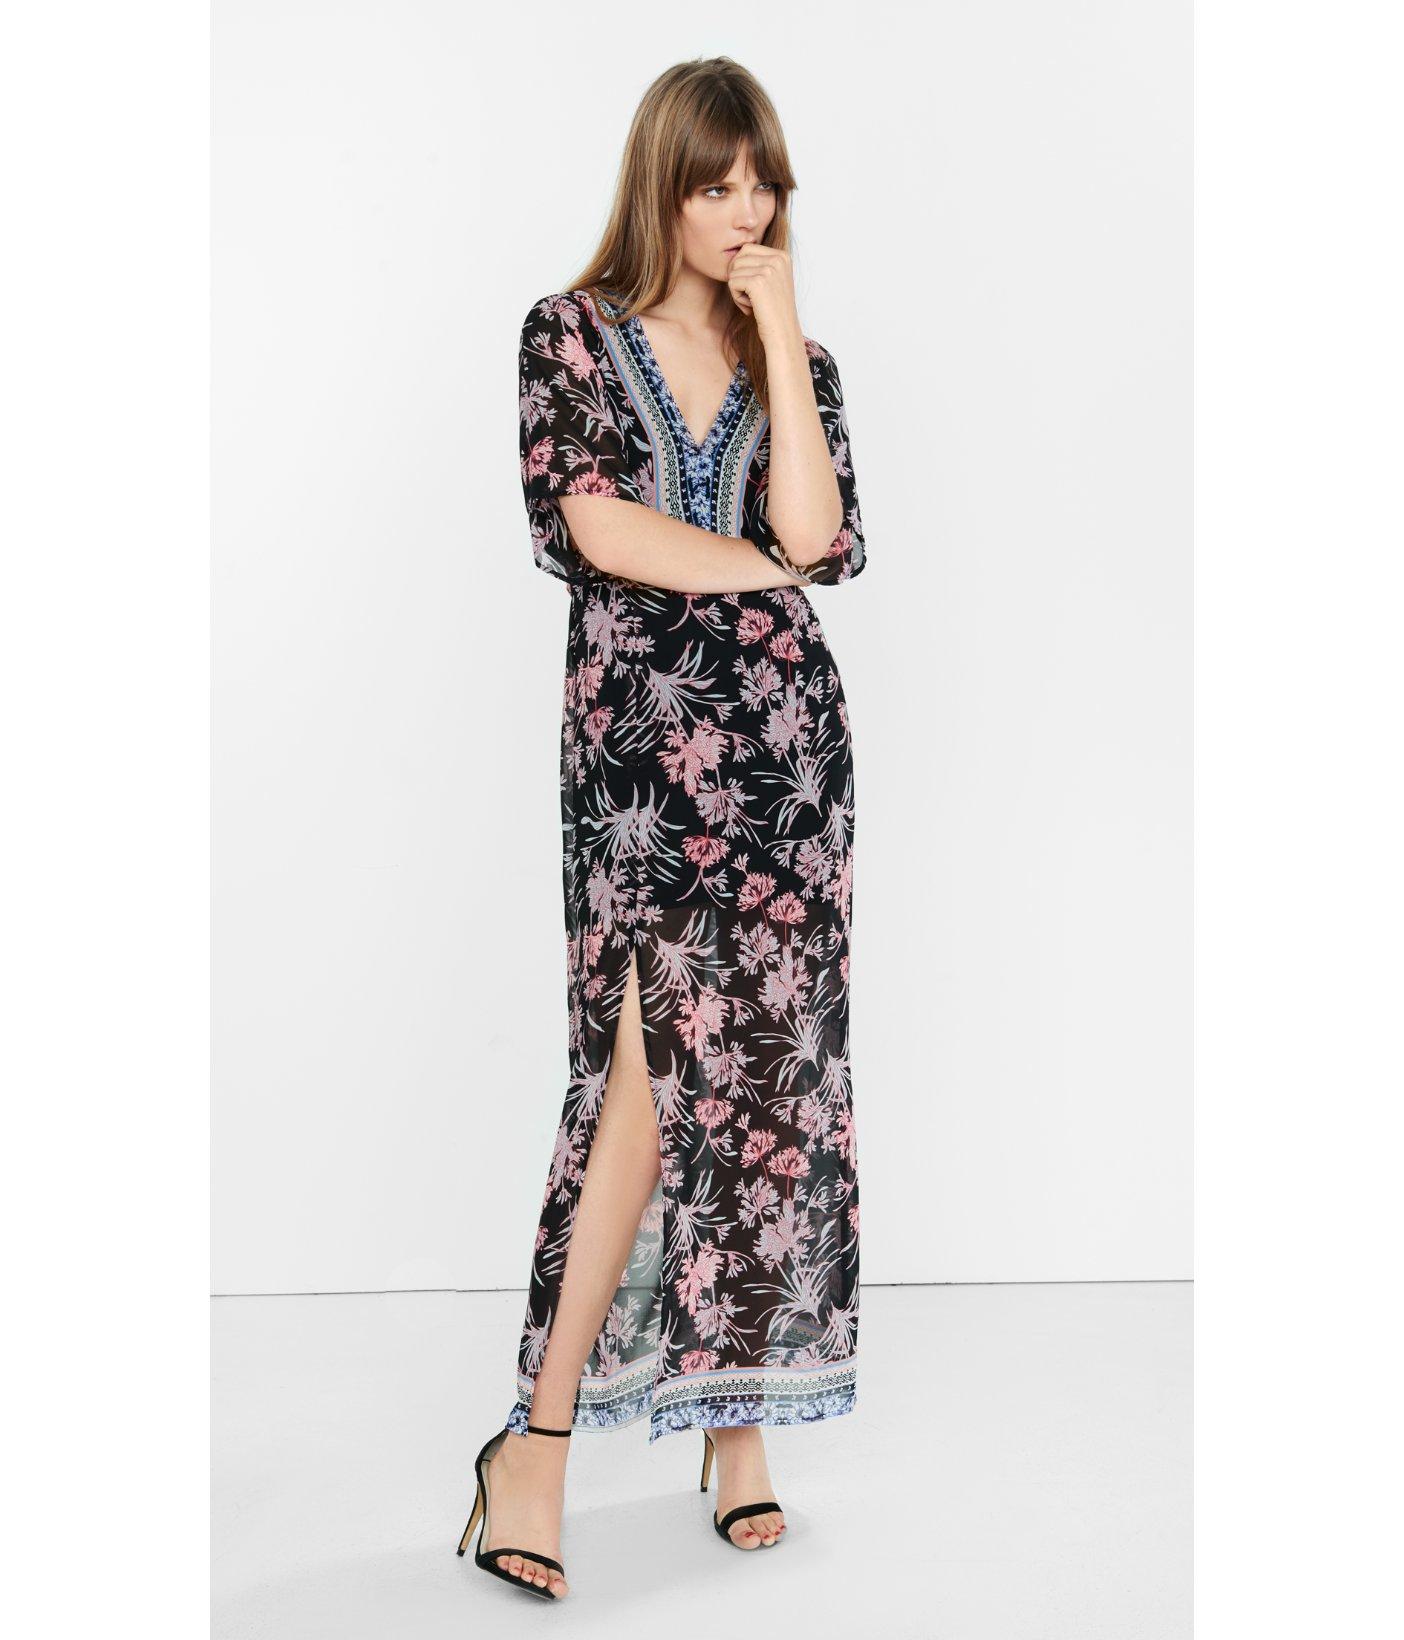 457549a3e9 Express Floral Print Kimono Sleeve Maxi Dress in Black - Lyst